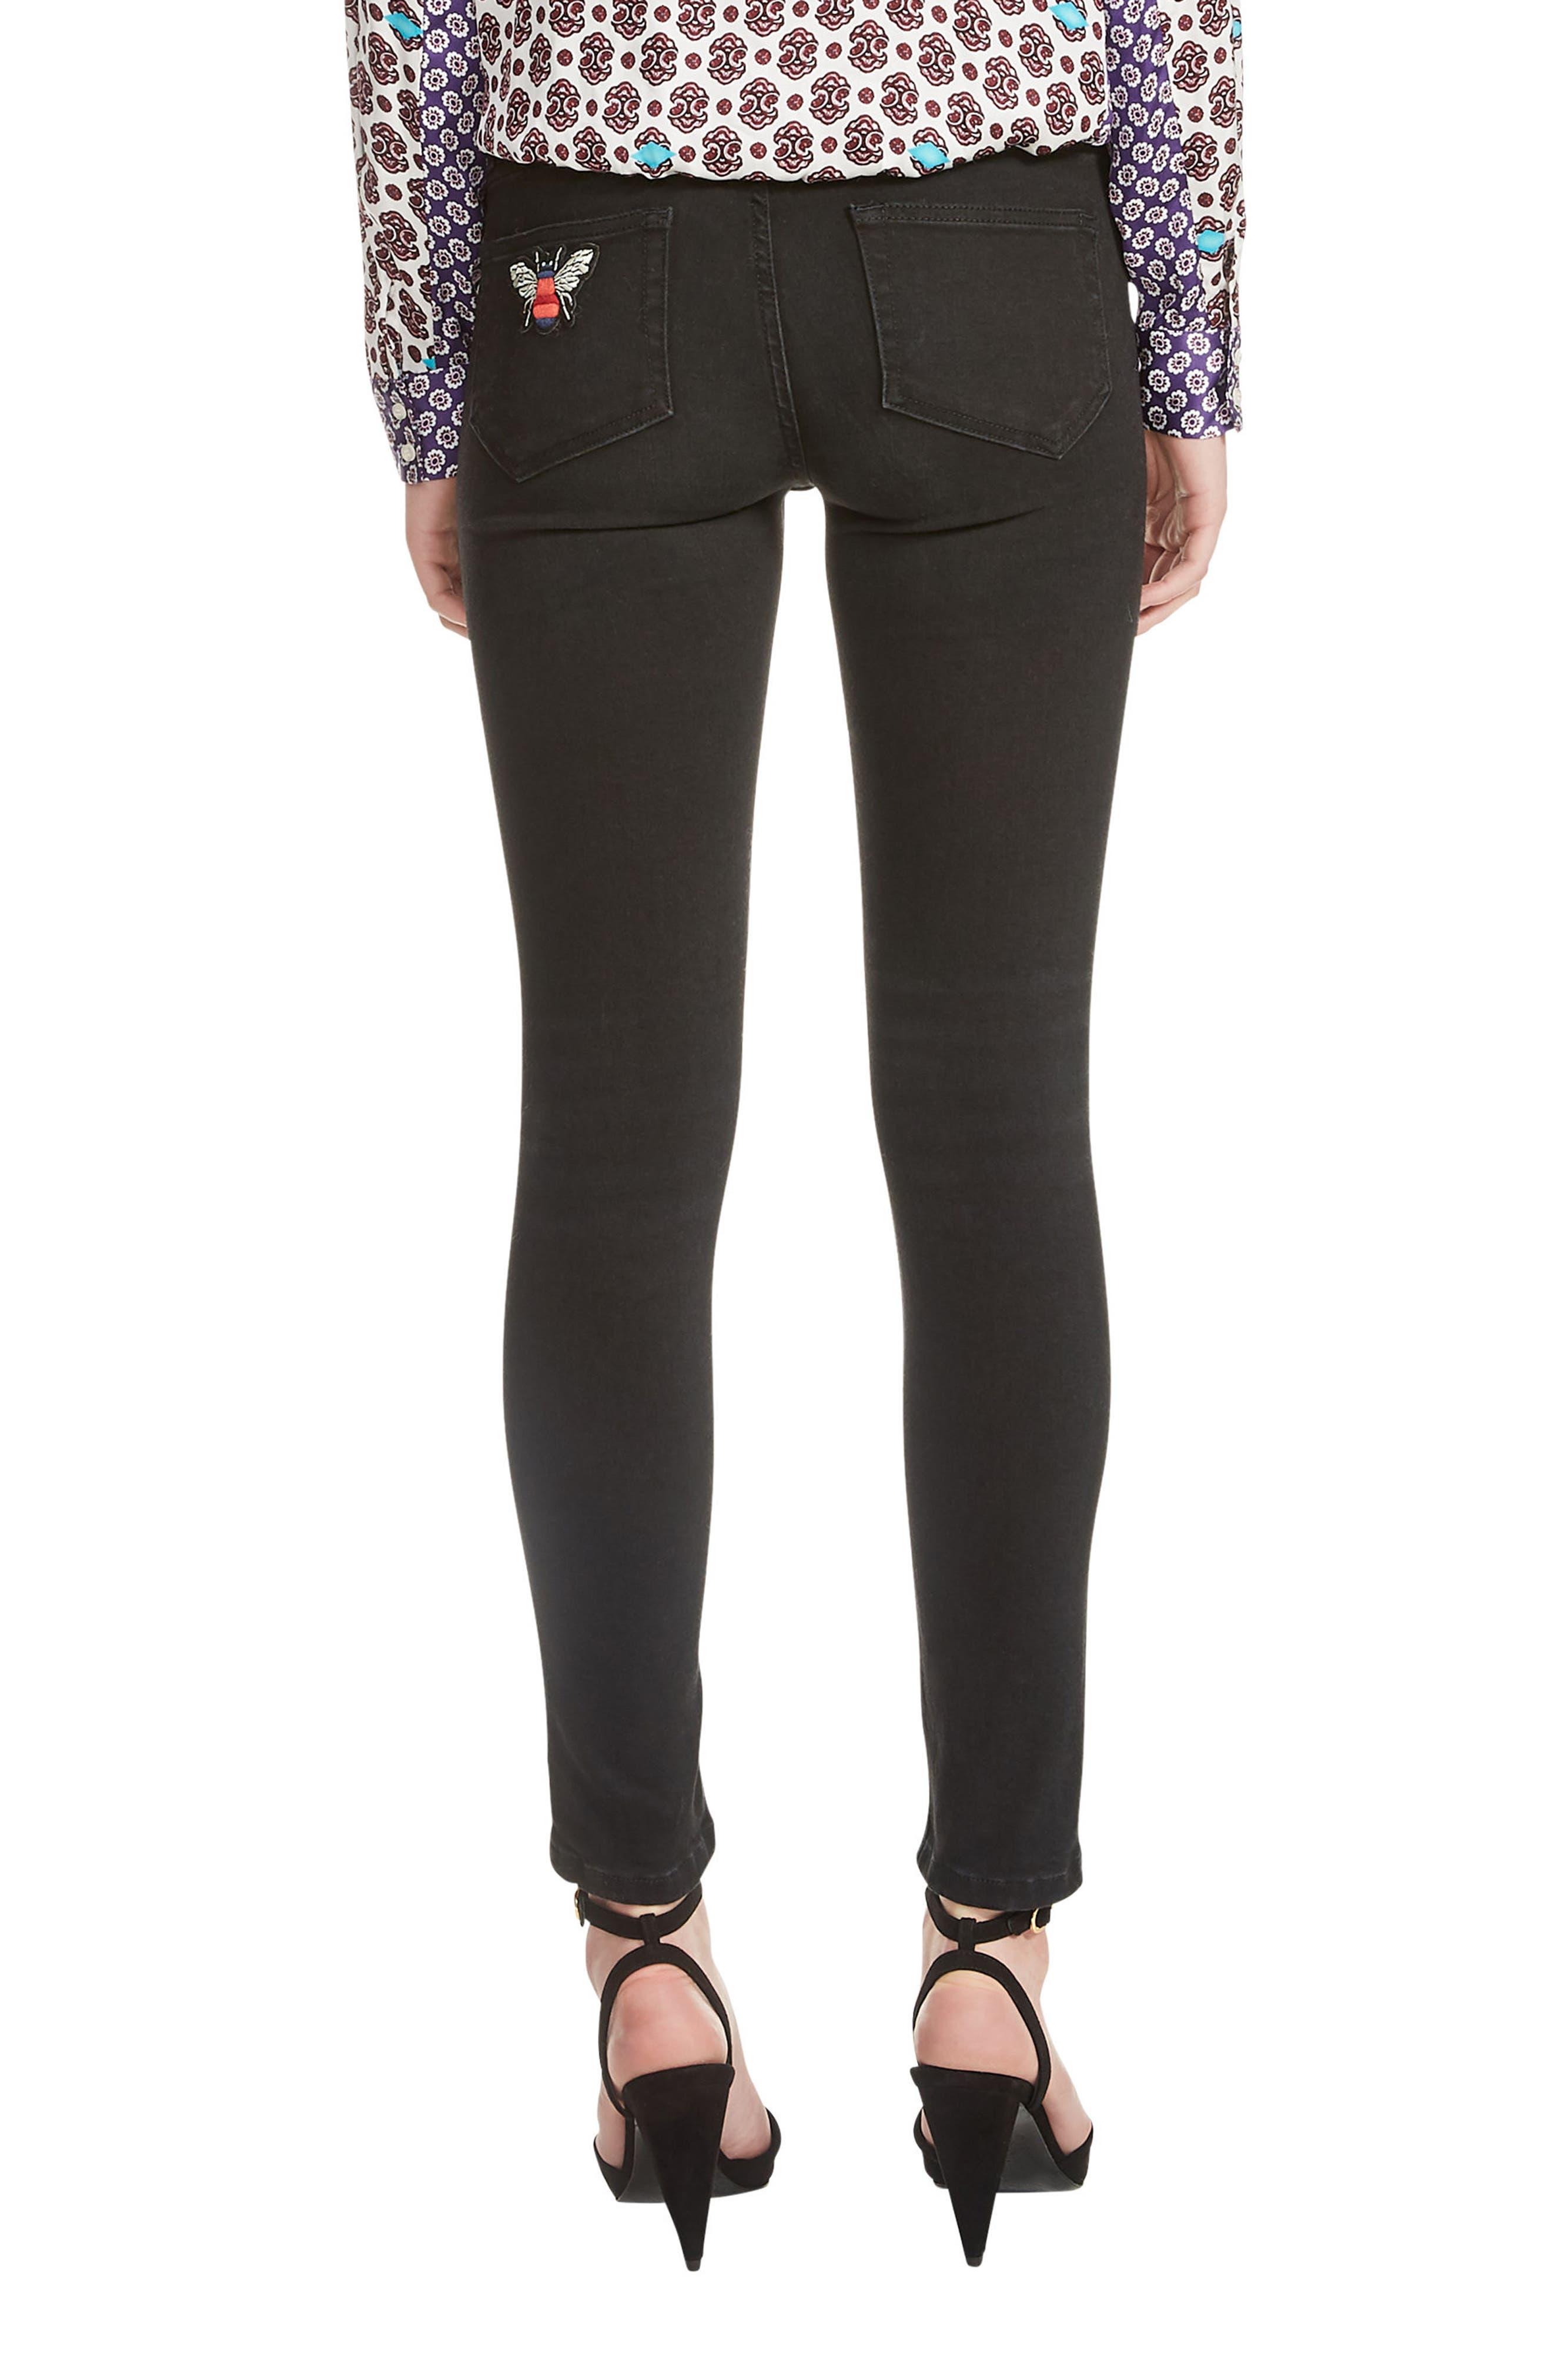 Priska Ripped Bee Embroidery Black Skinny Jeans,                             Alternate thumbnail 2, color,                             Black